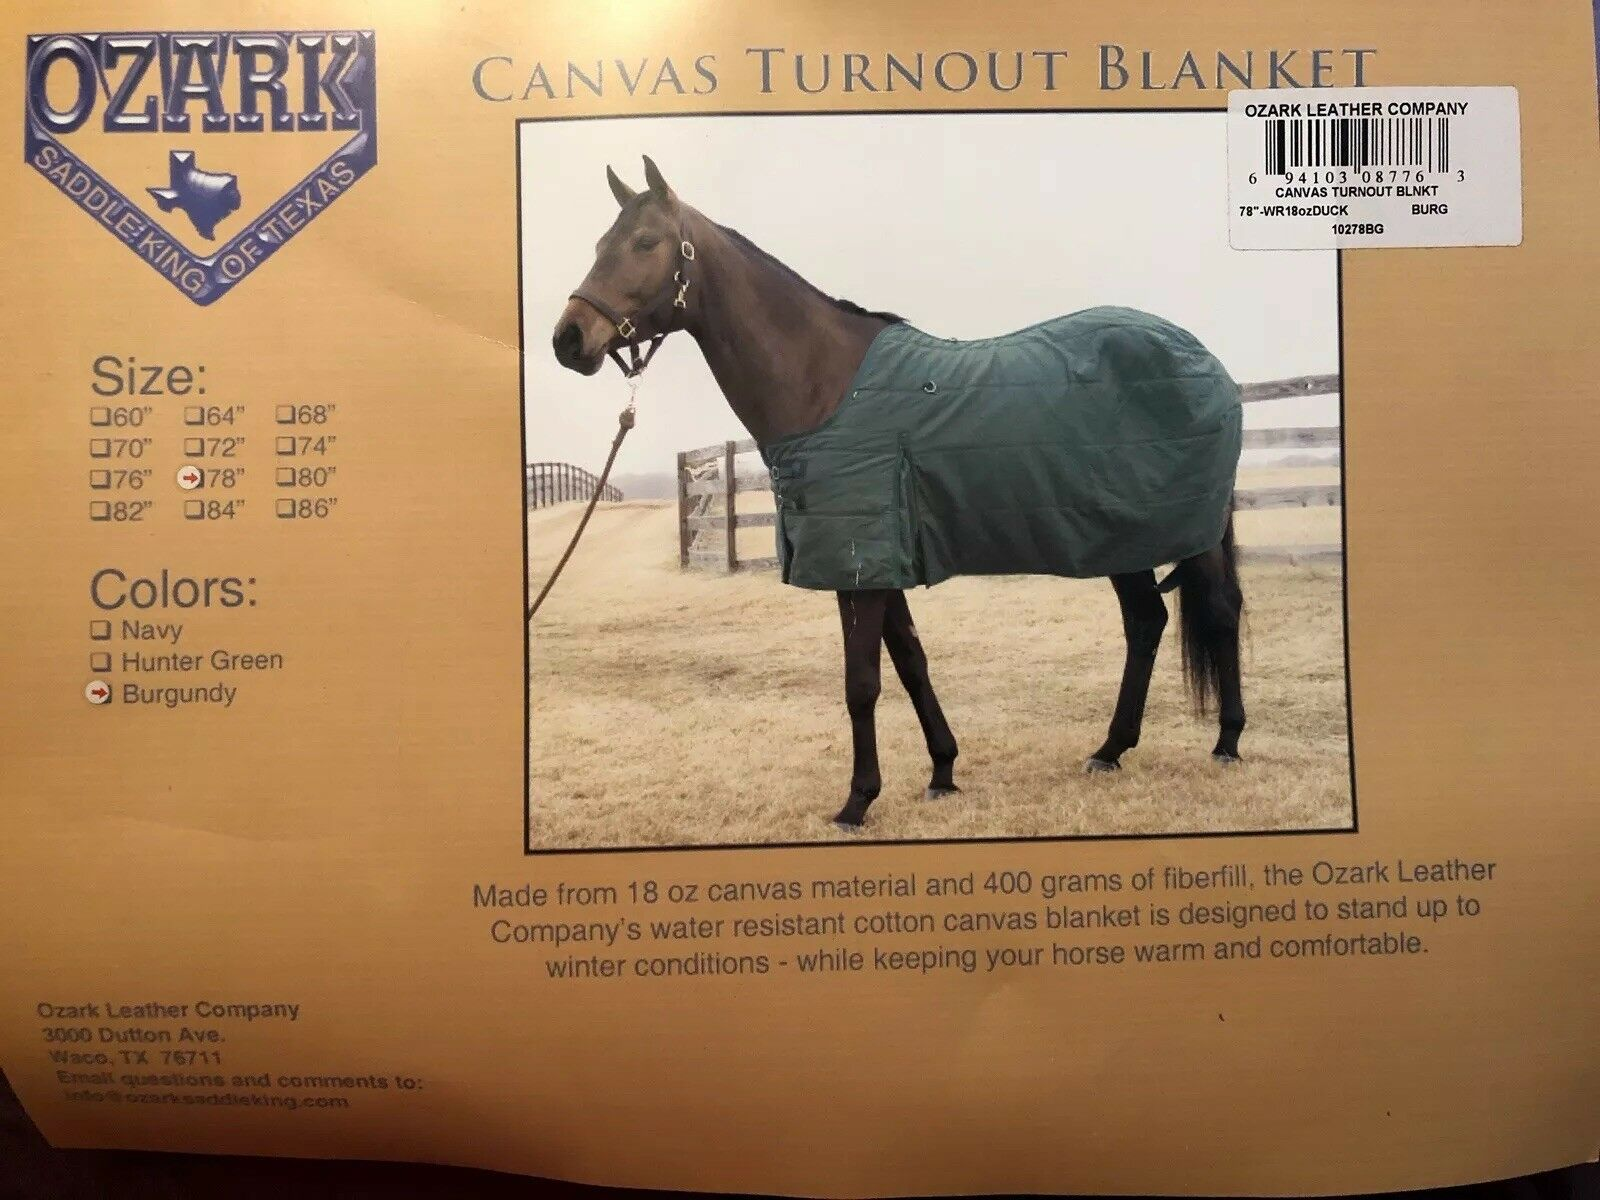 "New Ozark Learher Canvas Winter Horse Blanket Size 78"" Burgundy"